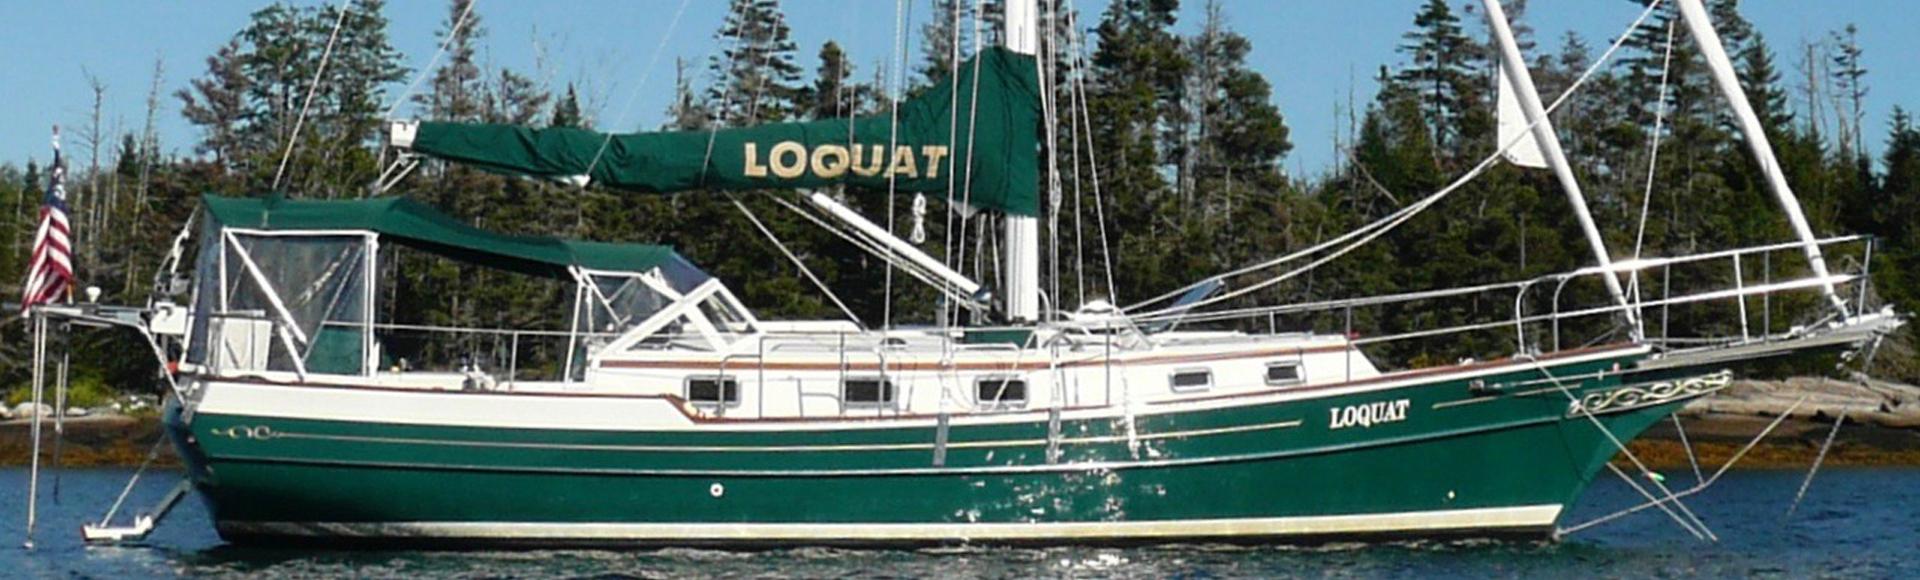 "SALE PENDING 2004 Gozzard 37B Hull #15 ""Loquat"""